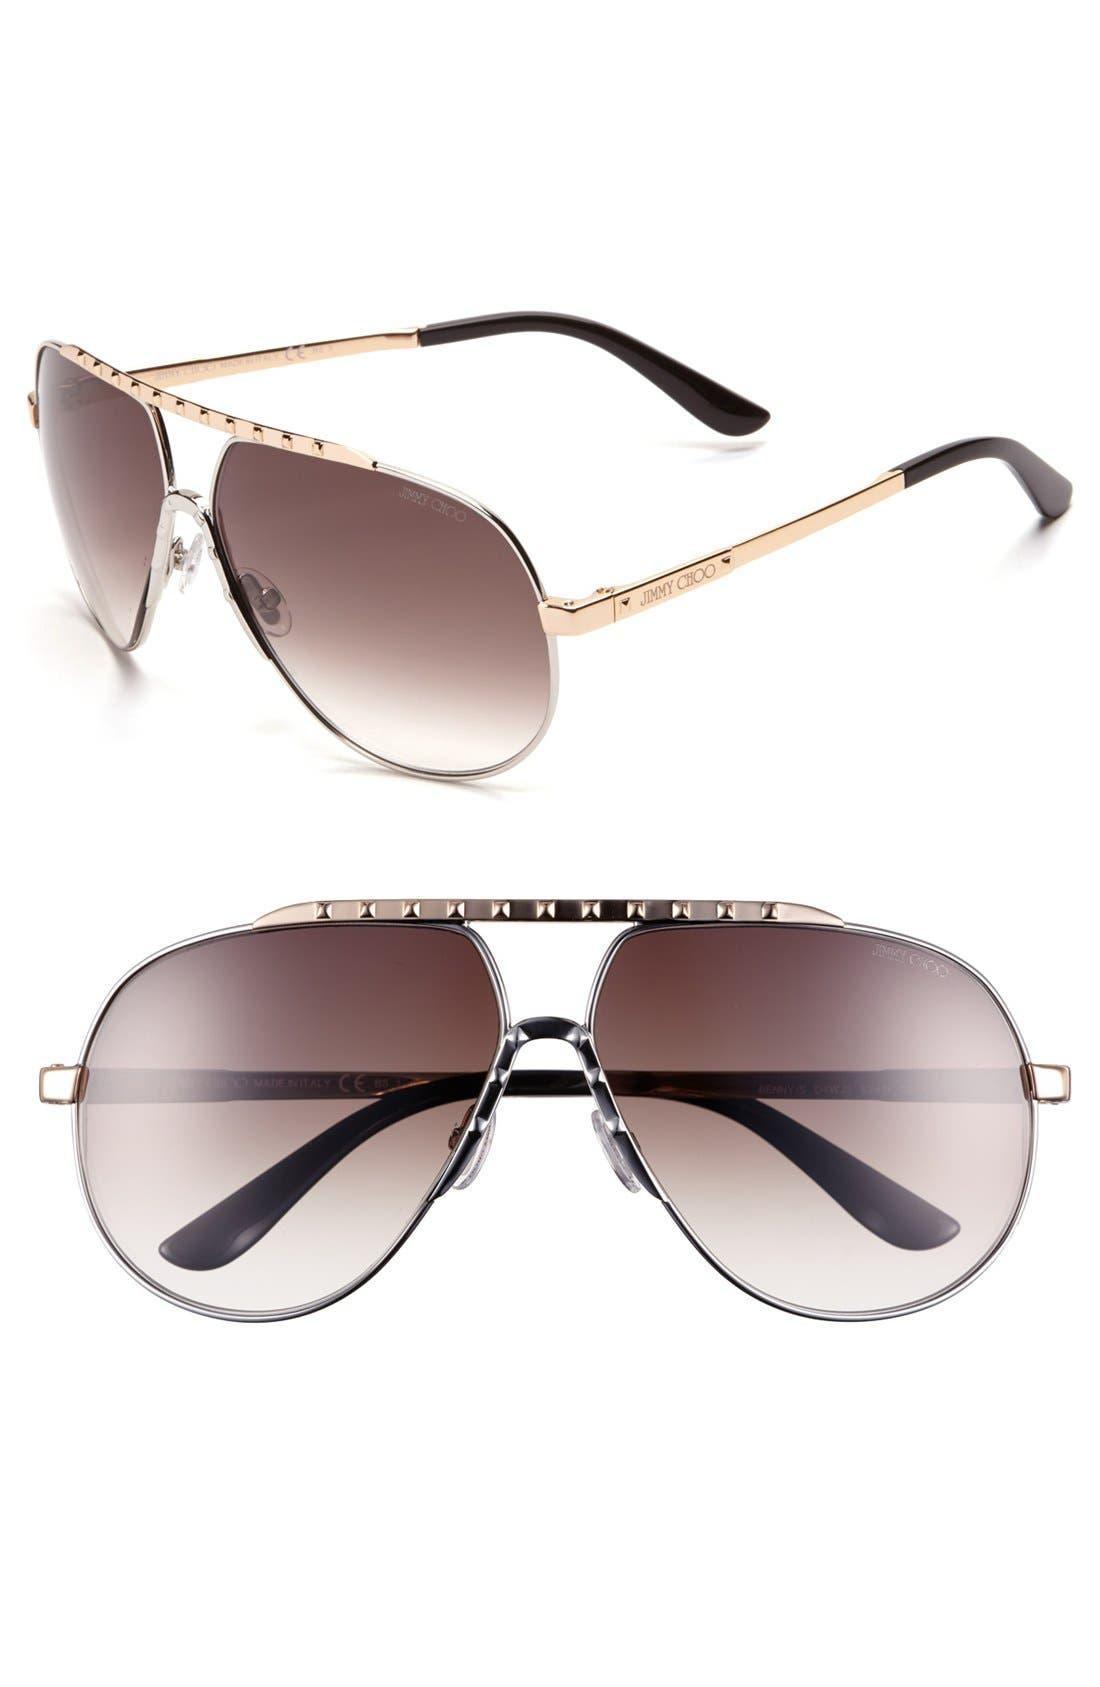 Alternate Image 1 Selected - Jimmy Choo 62mm Stainless Steel Aviator Sunglasses